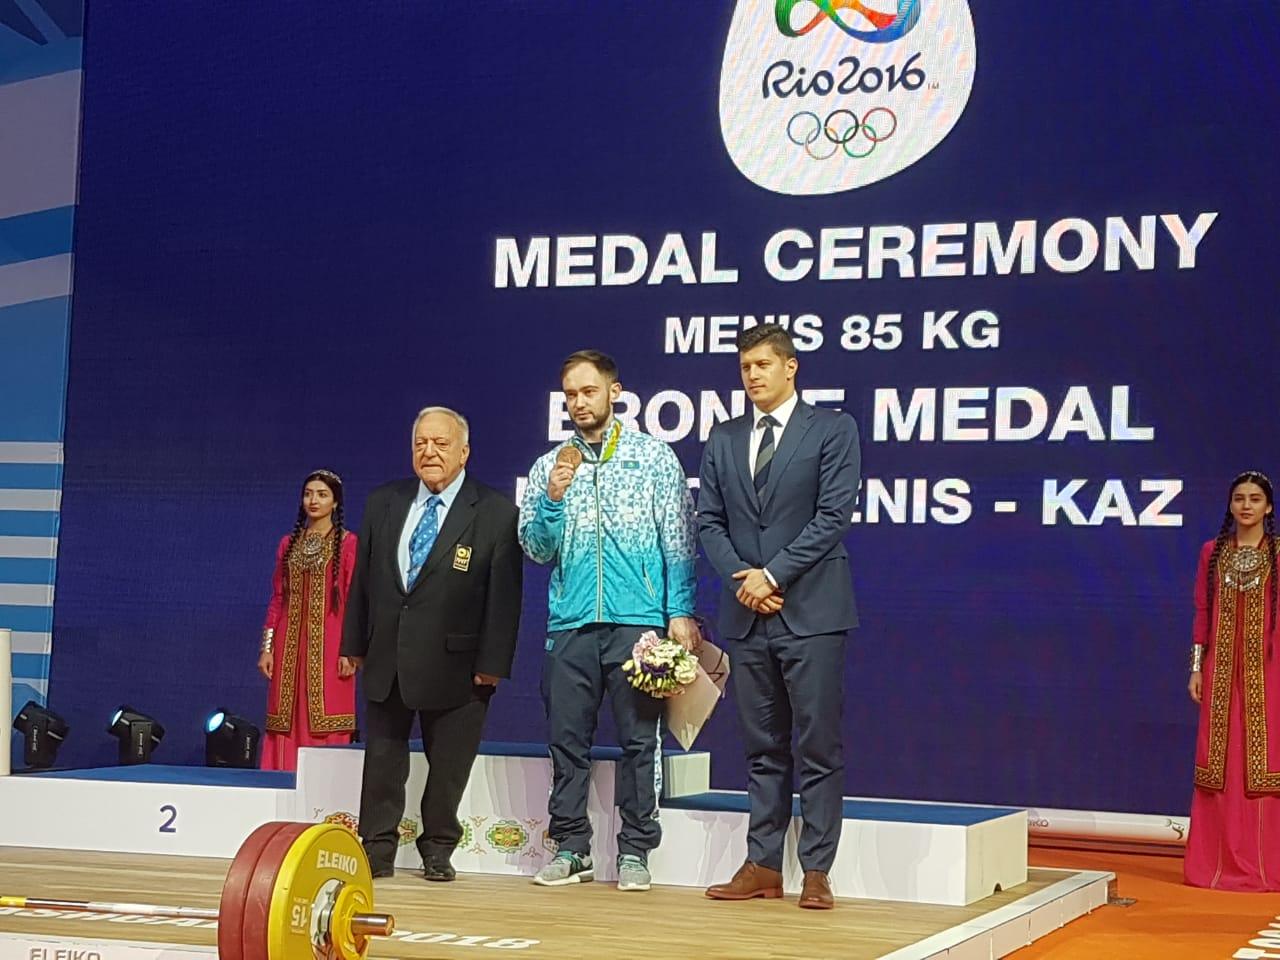 Казахстанцу Денису Уланову вручили бронзовую медаль Олимпиады-2016